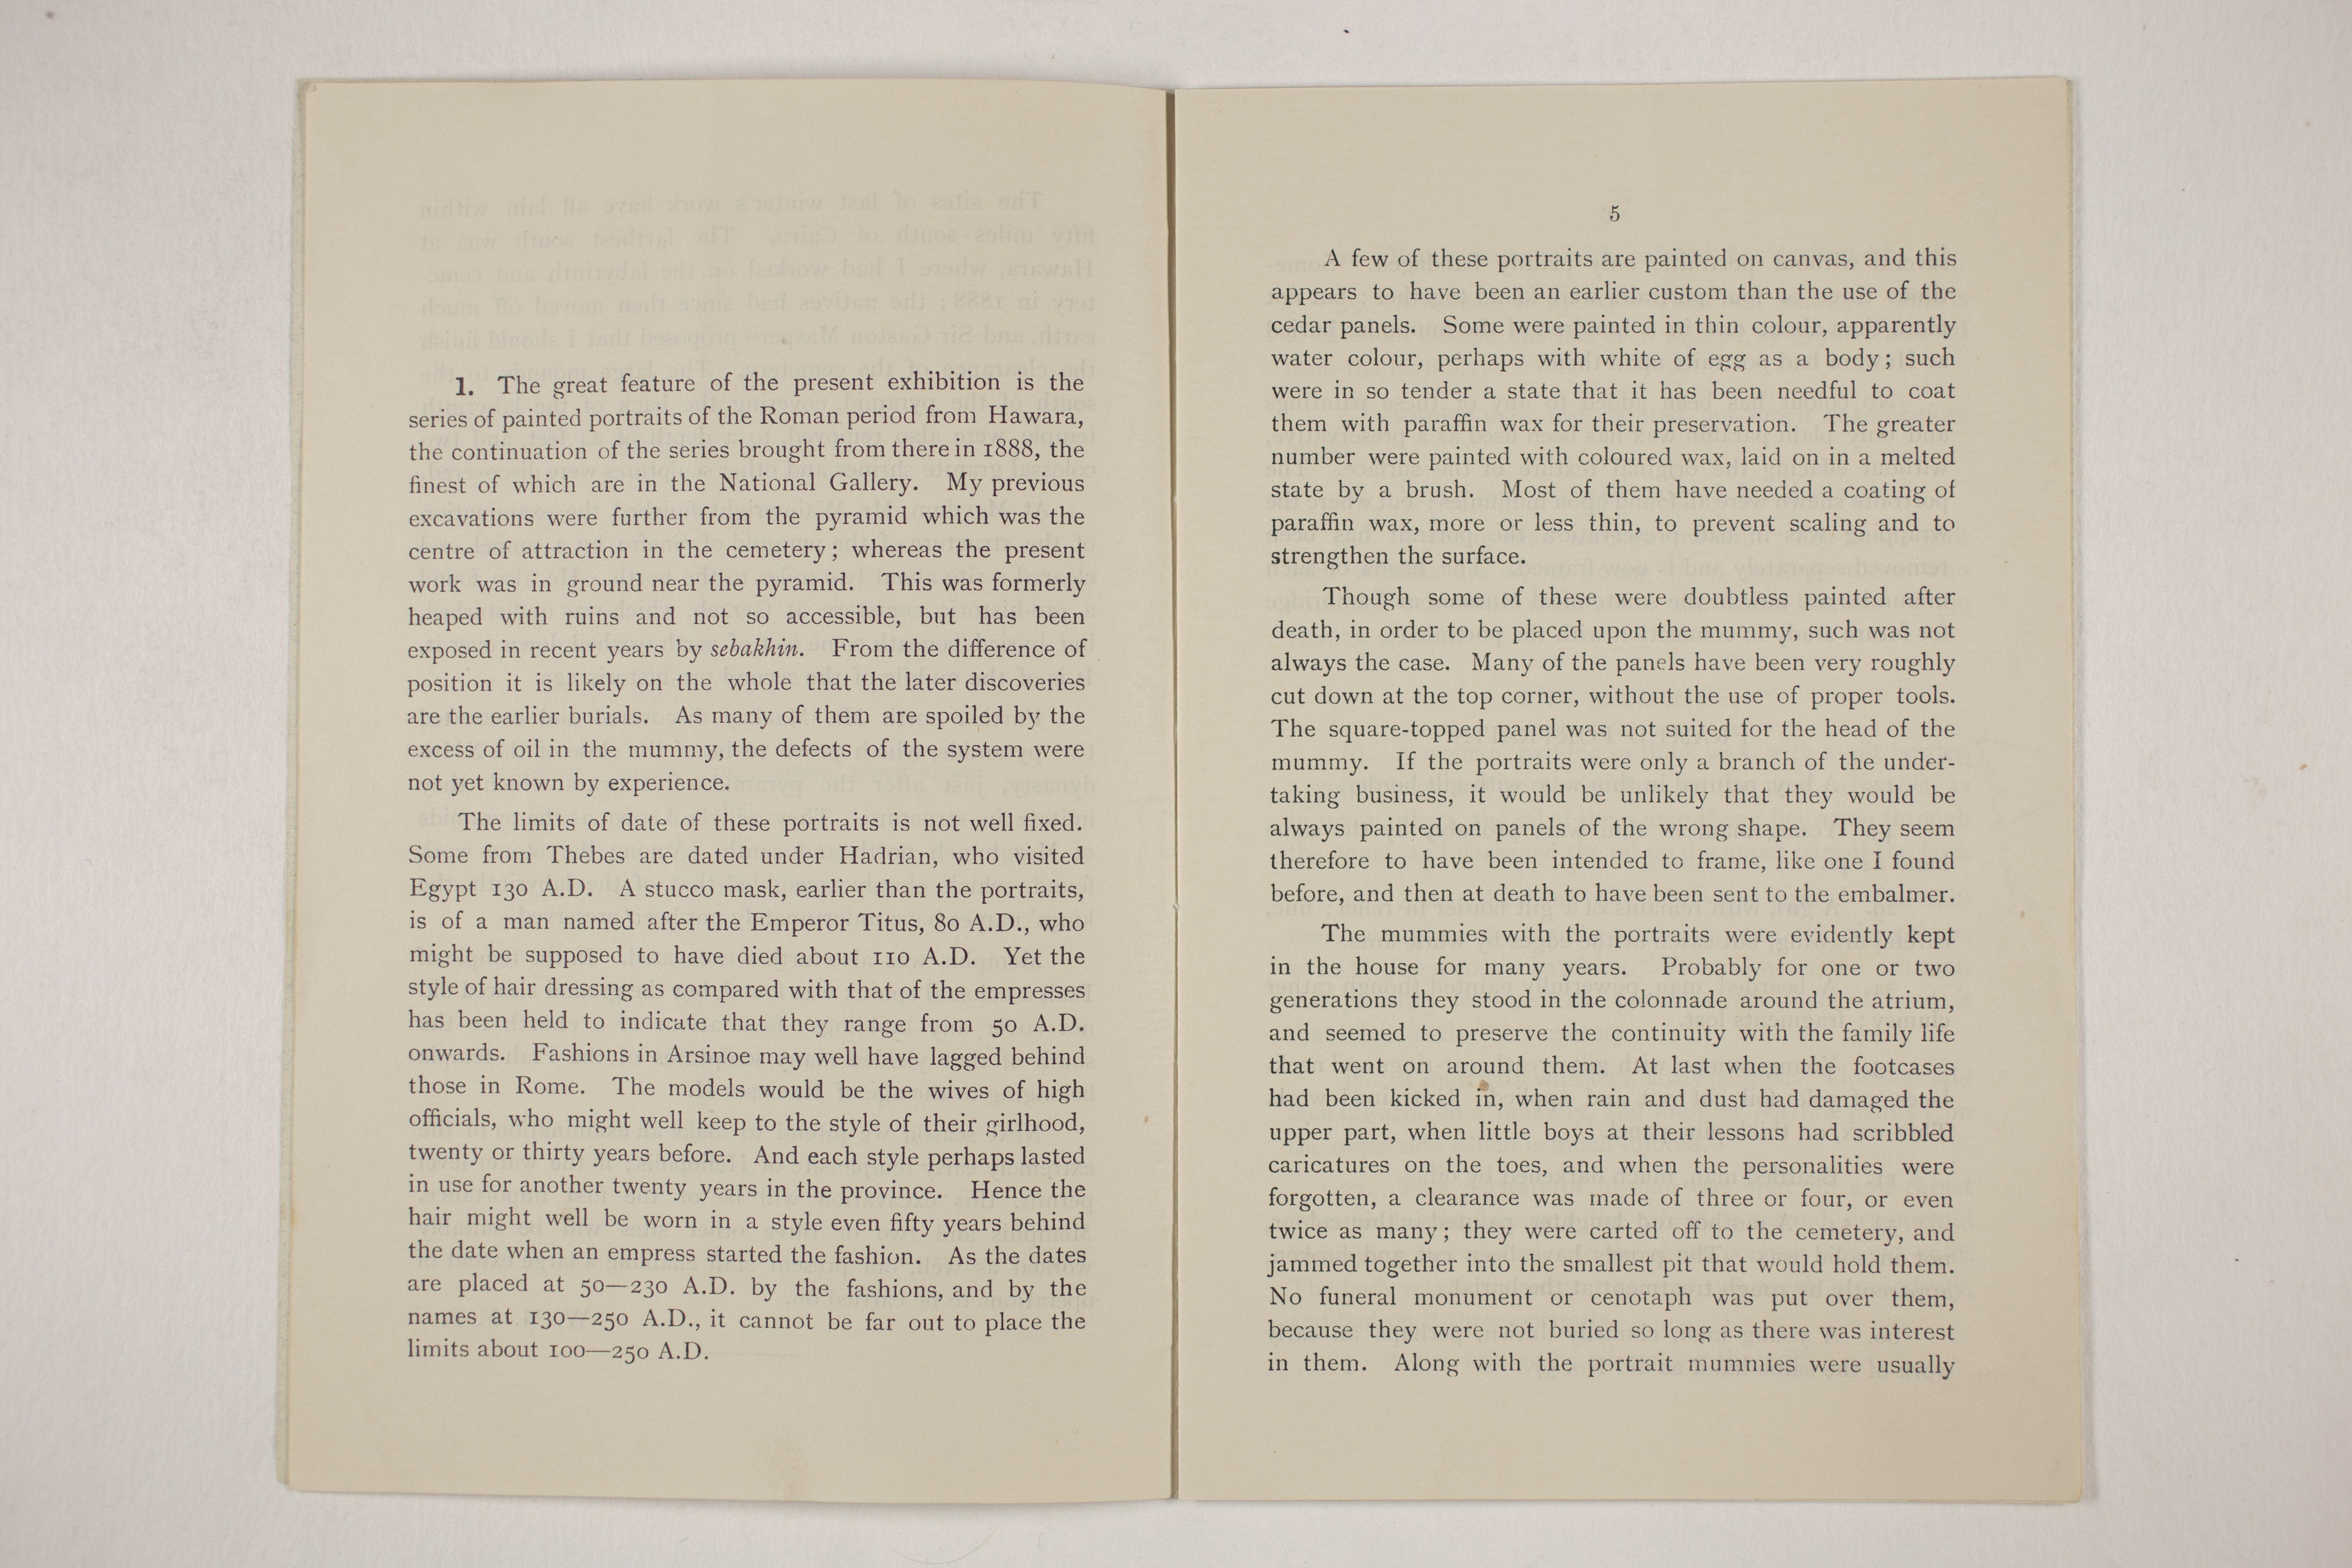 1910-11 Hawara, Gerzeh, Memphis, Mazghuneh Exhibition catalogue PMA/WFP1/D/19/34.4